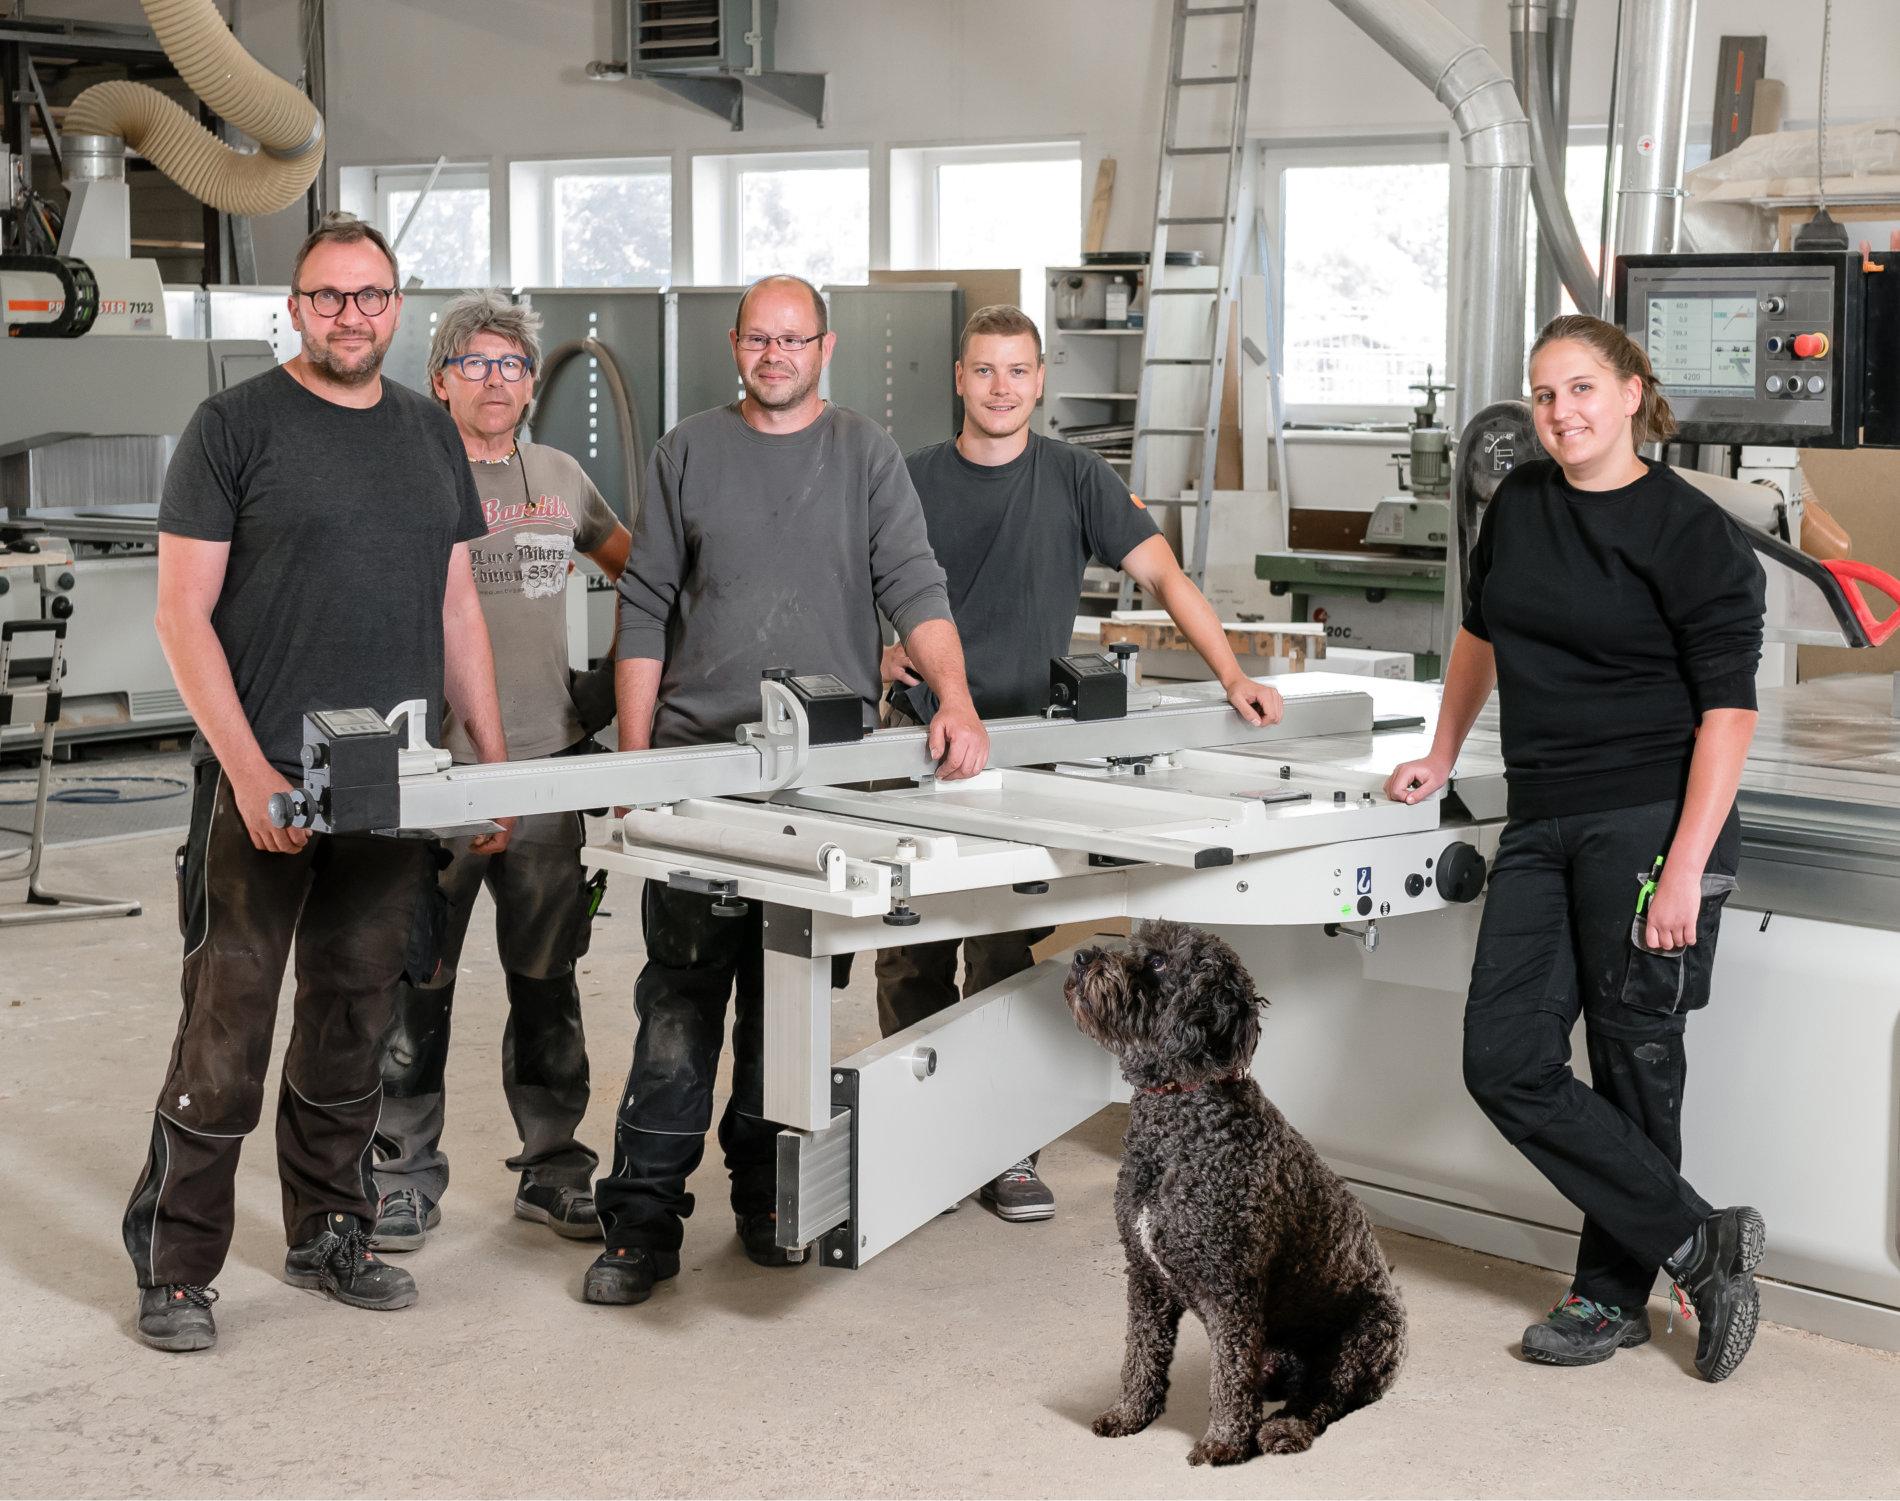 tischlerei altfeld - teamfoto mit hund